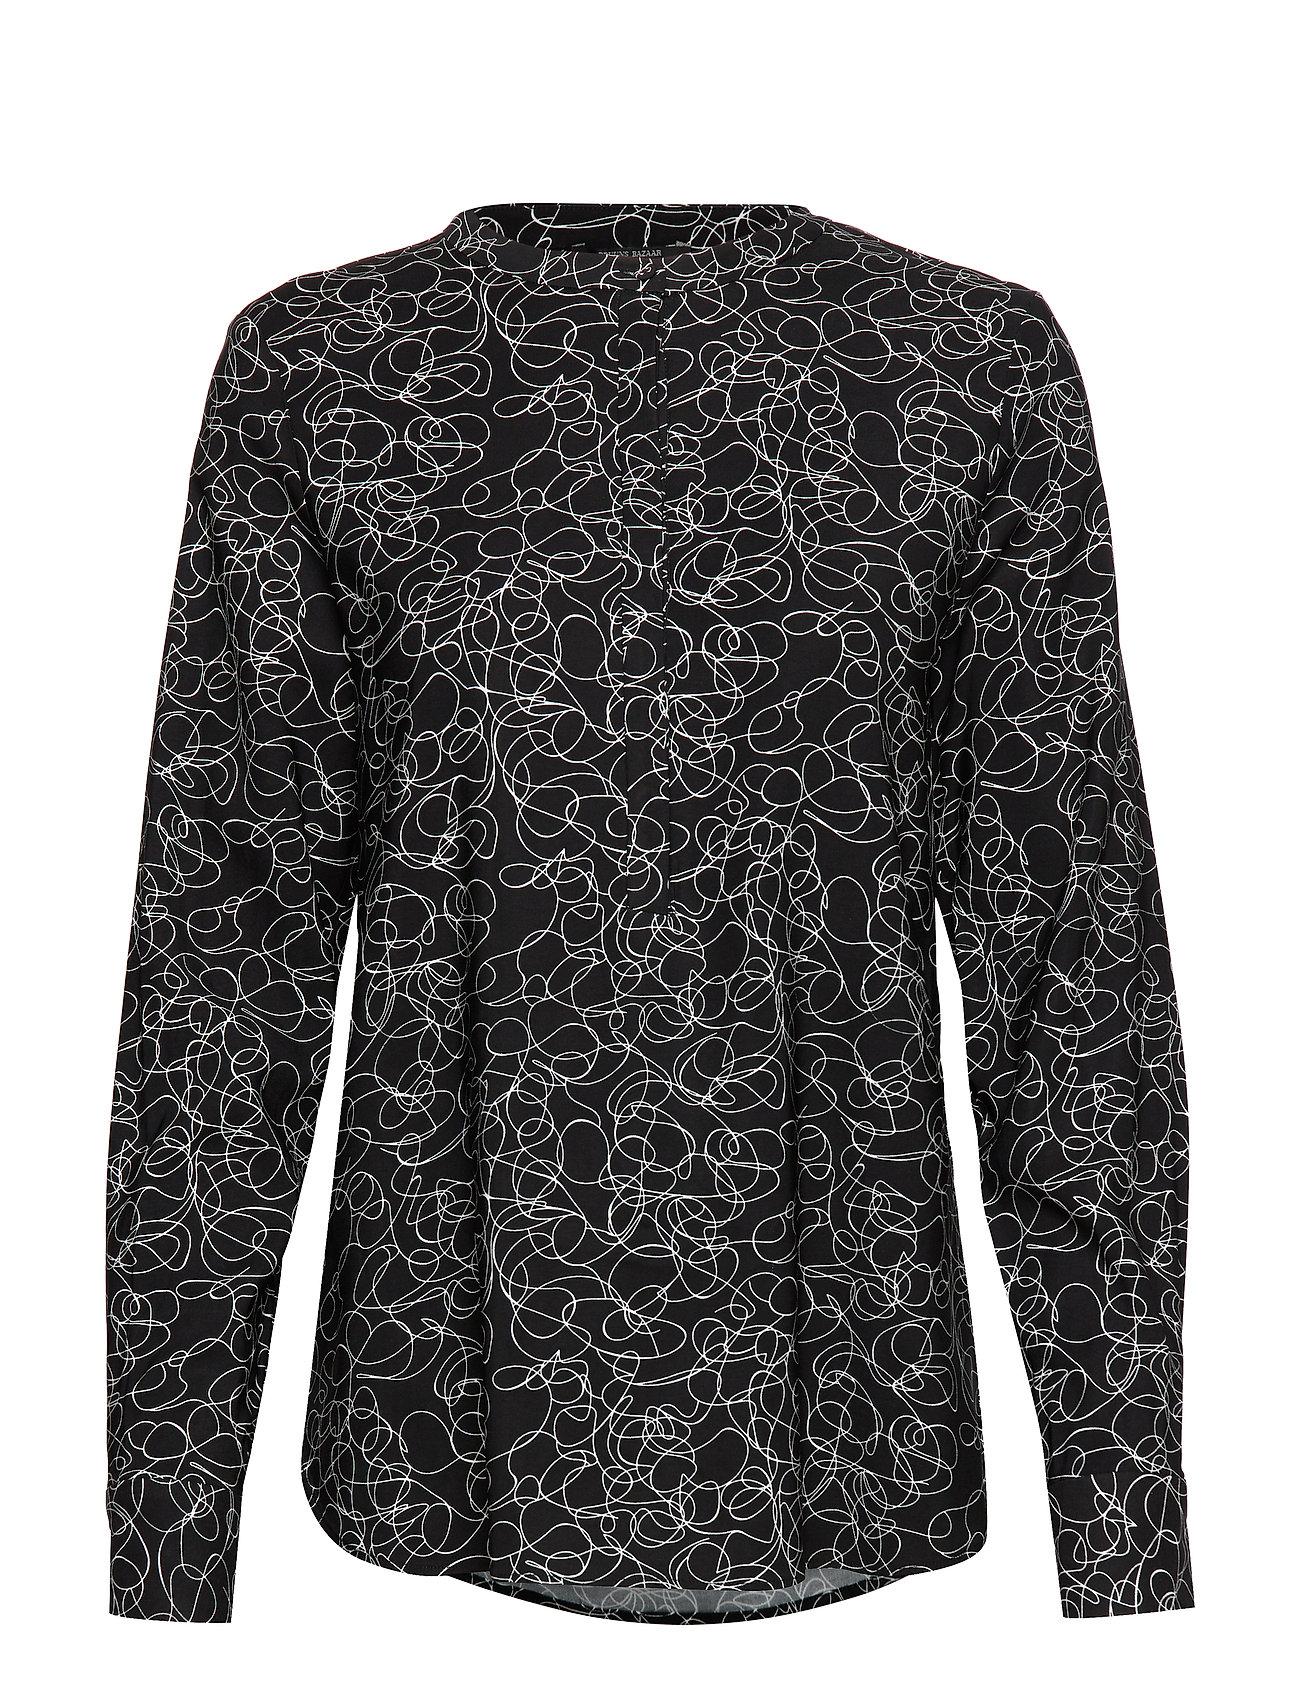 Bruuns Bazaar Sketch Inglis shirt - SKETCH ARTWORK